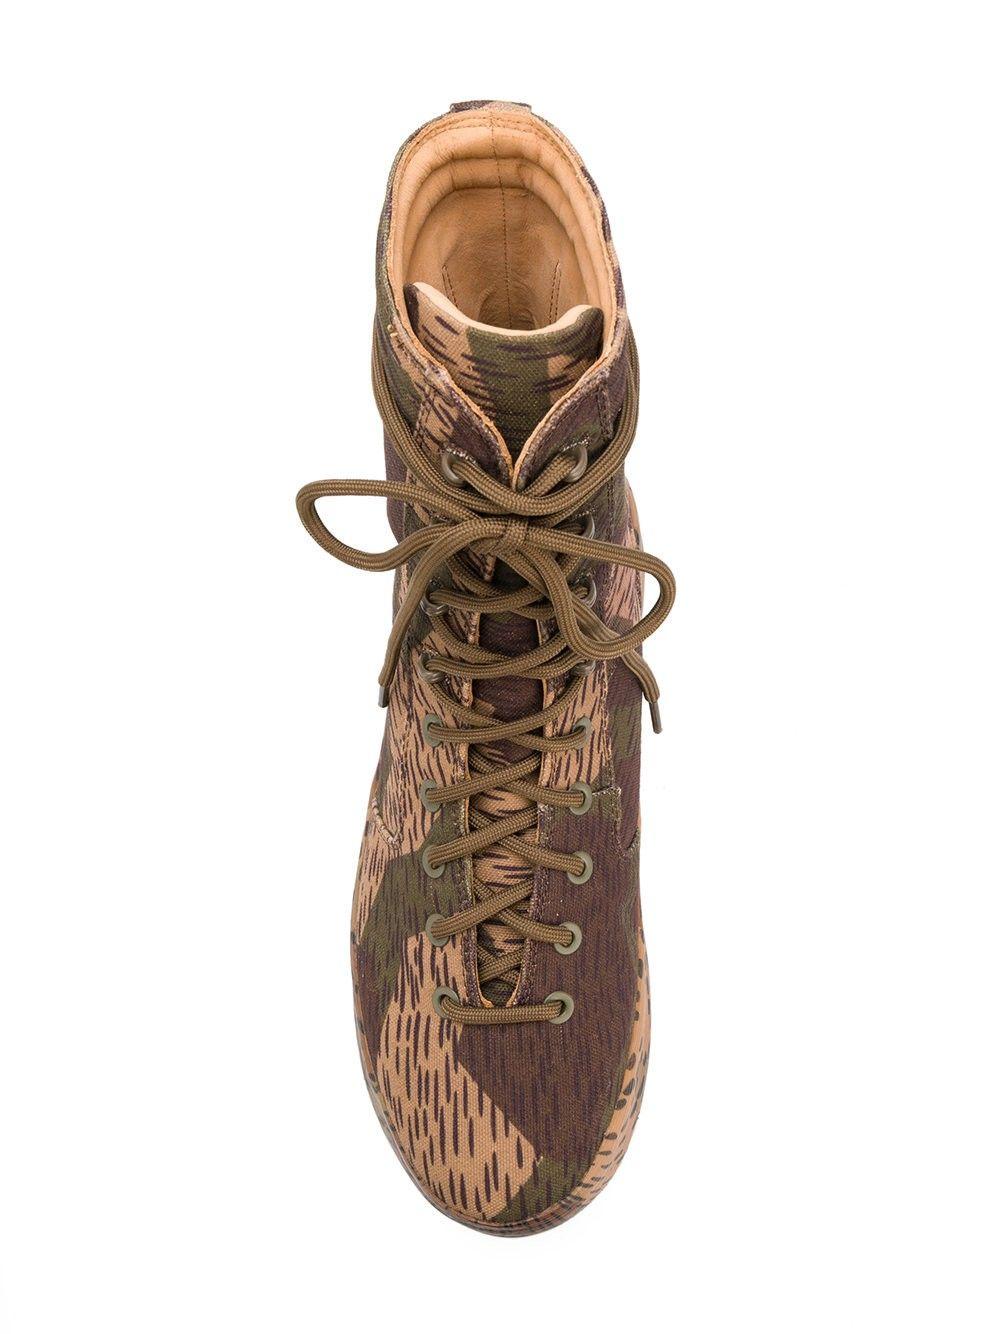 5941ca78c6457 Yeezy Season 6 Military Boots - It41 Green. YEEZY SPLINTER CAMO ...